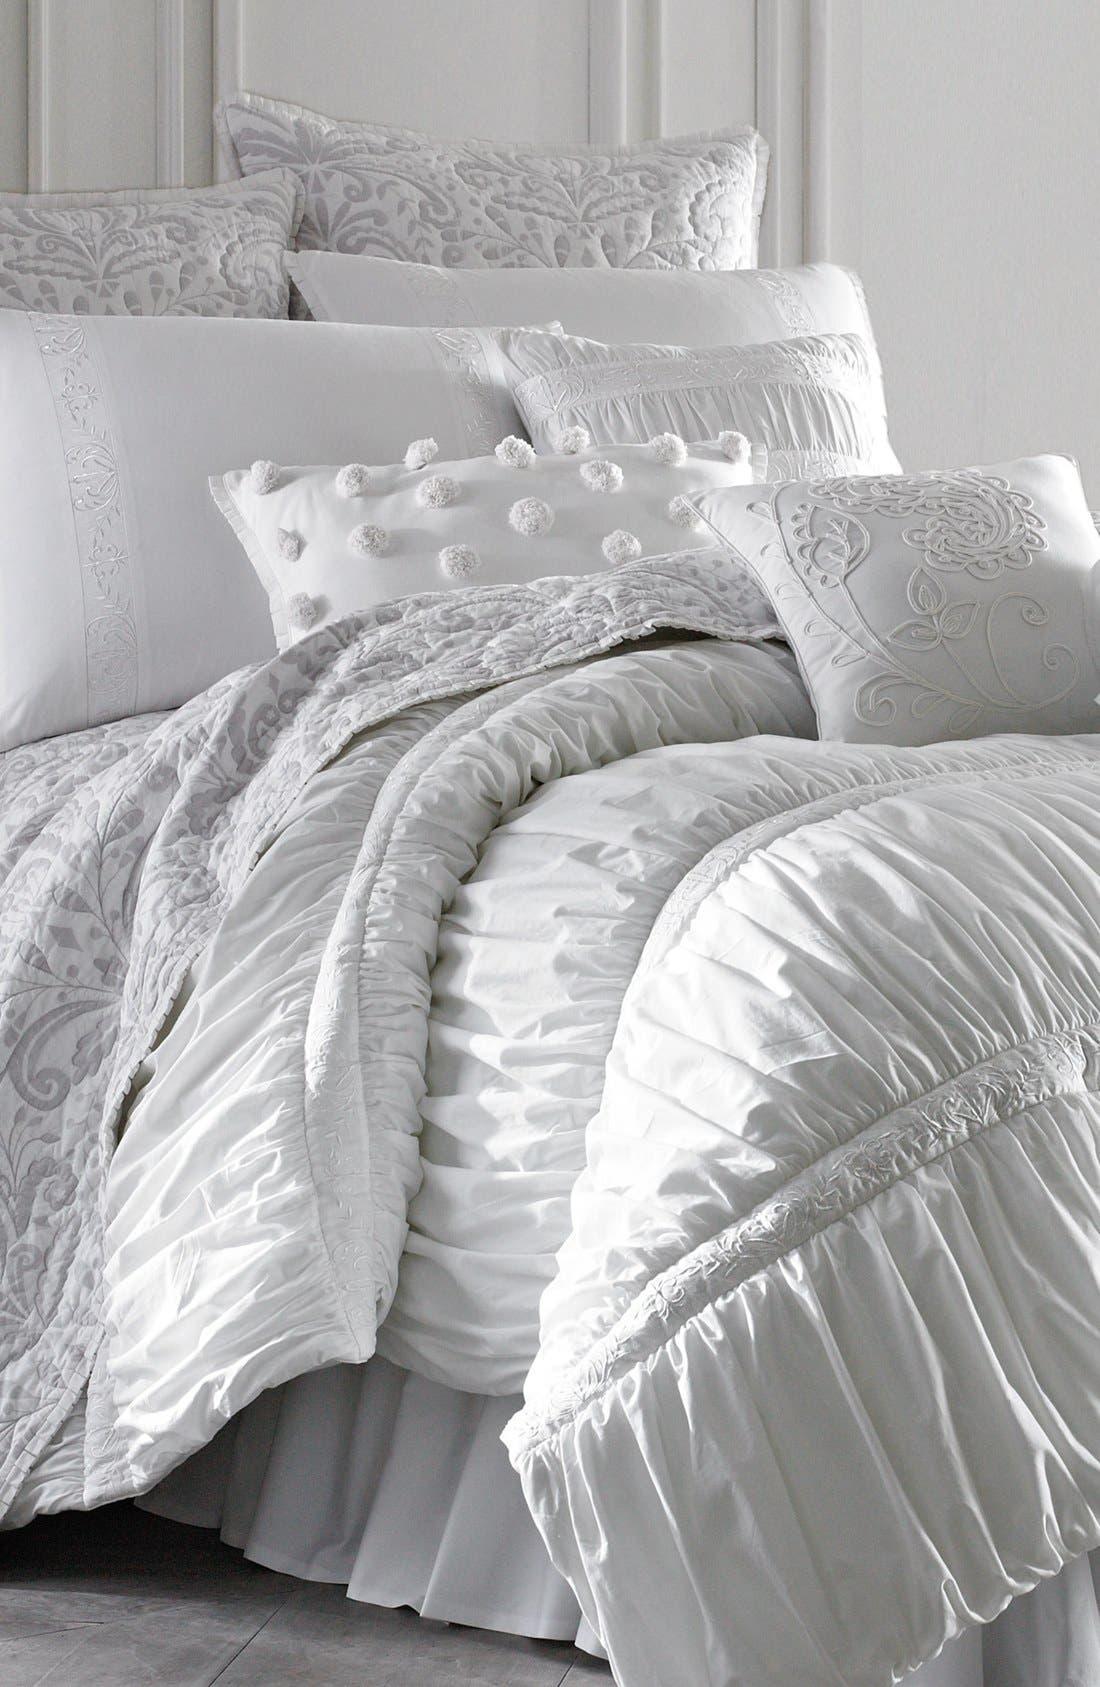 Alternate Image 1 Selected - Dena Home 'Morning Dove' Comforter